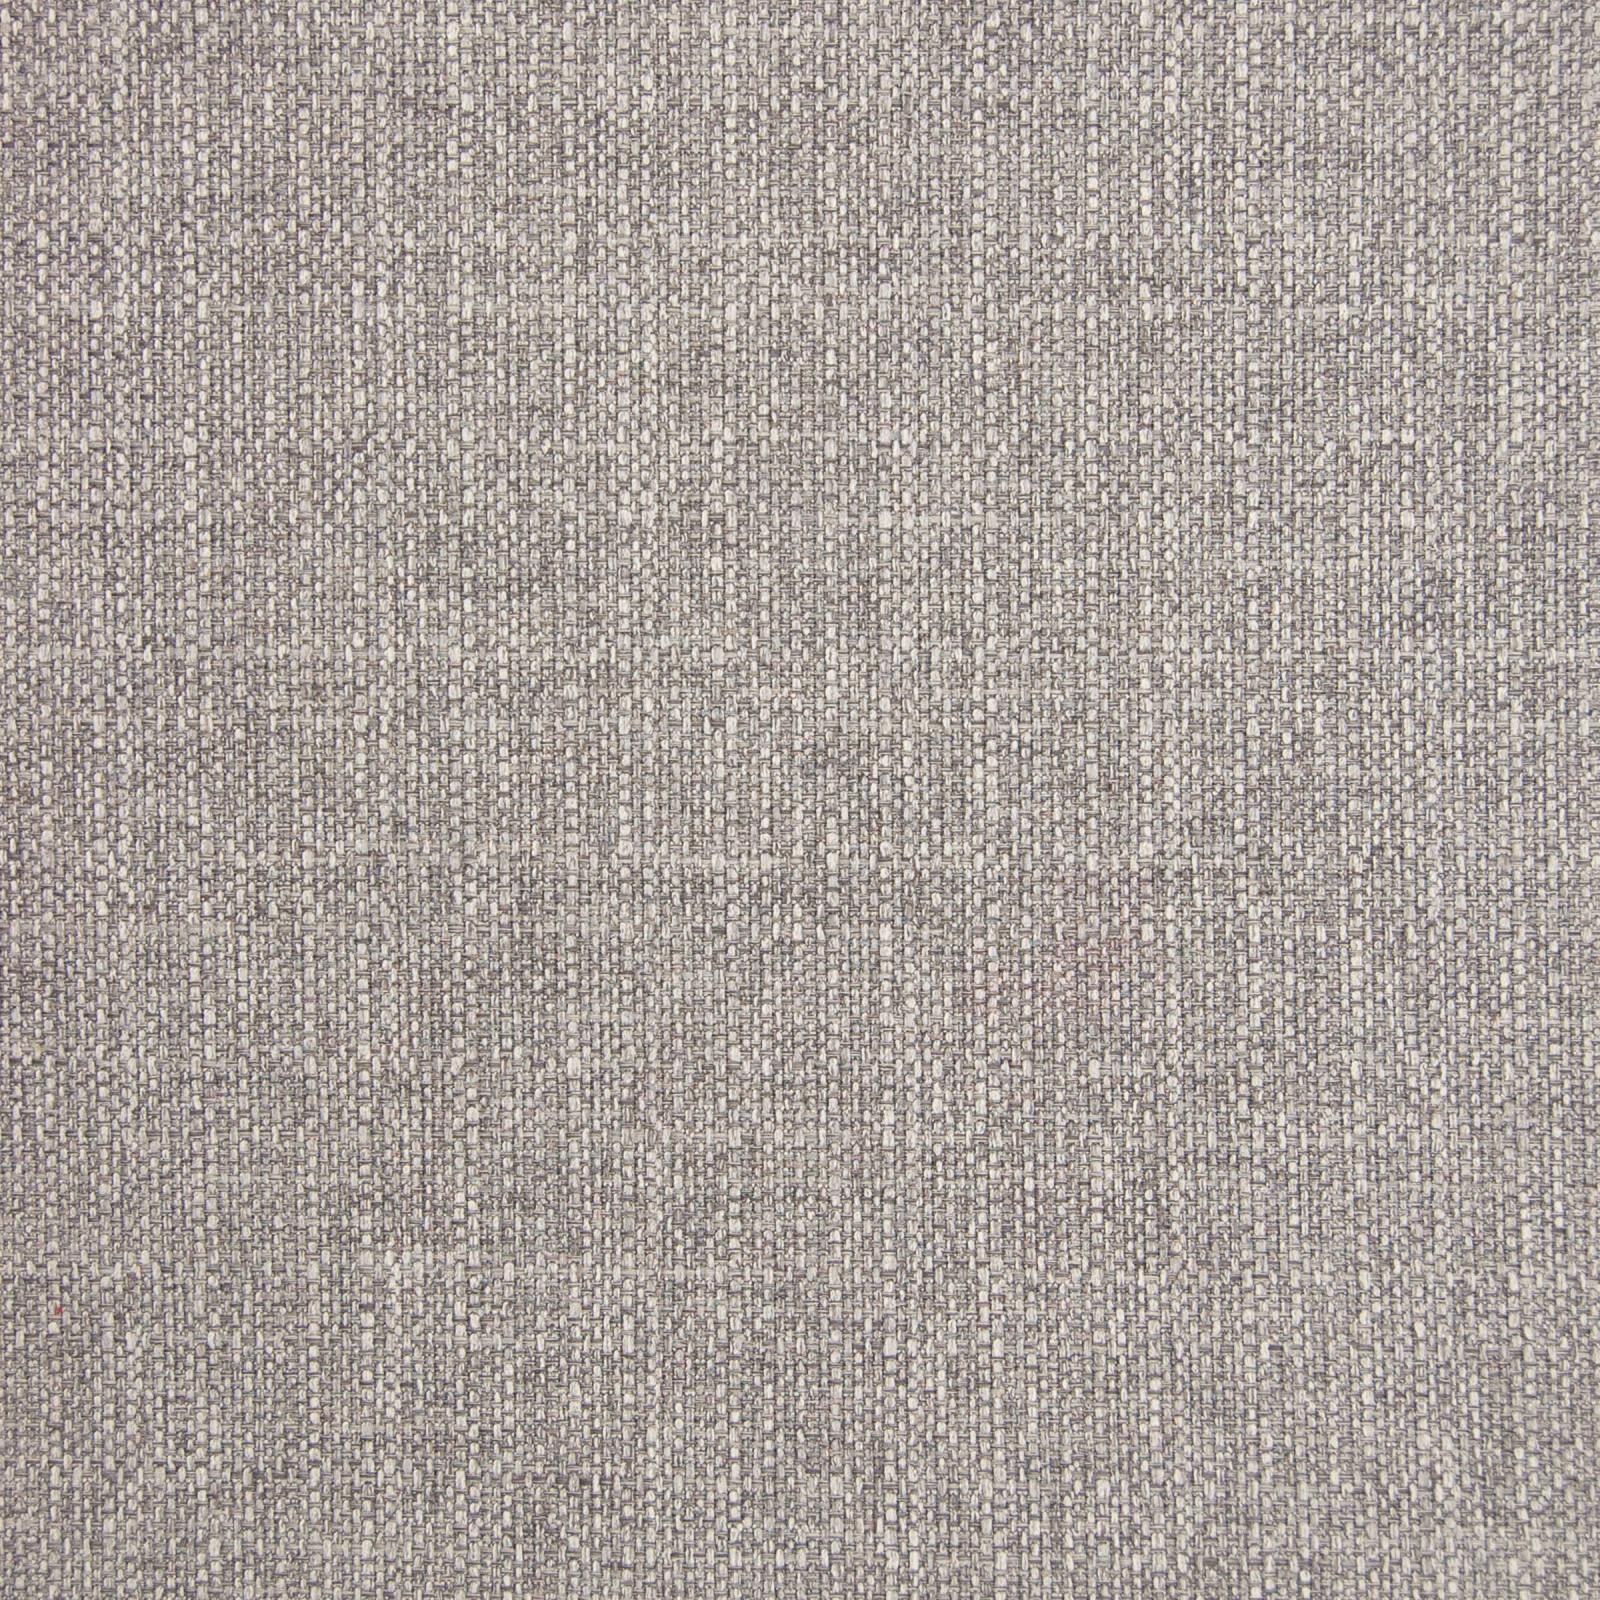 B5537 Silver Lining Greenhouse Fabrics